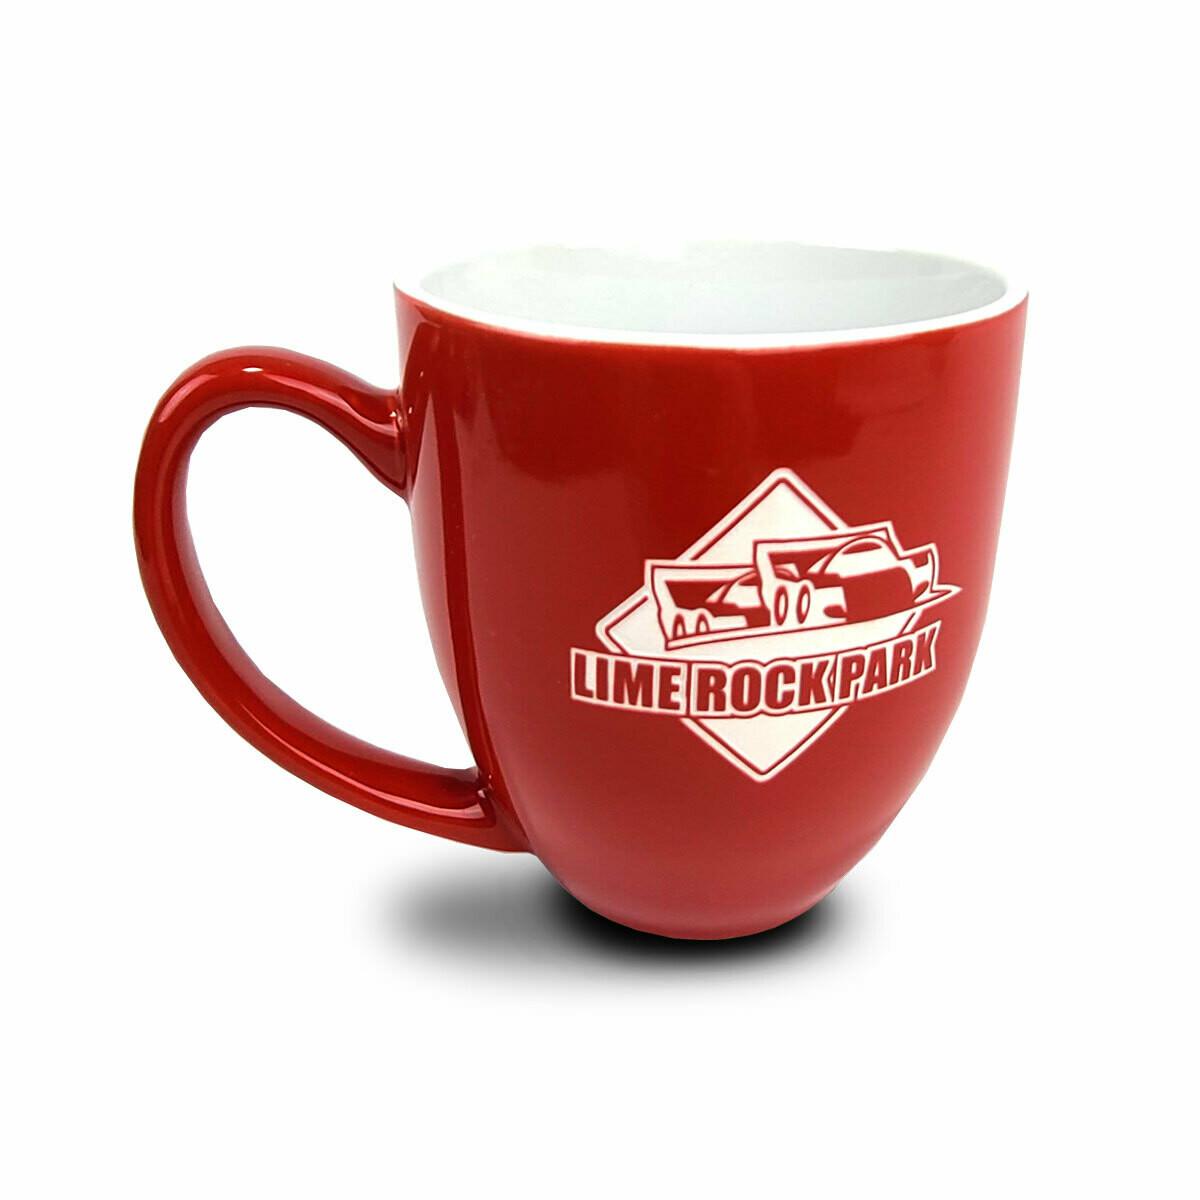 Lime Rock Bristo Coffee Mug - Red/White